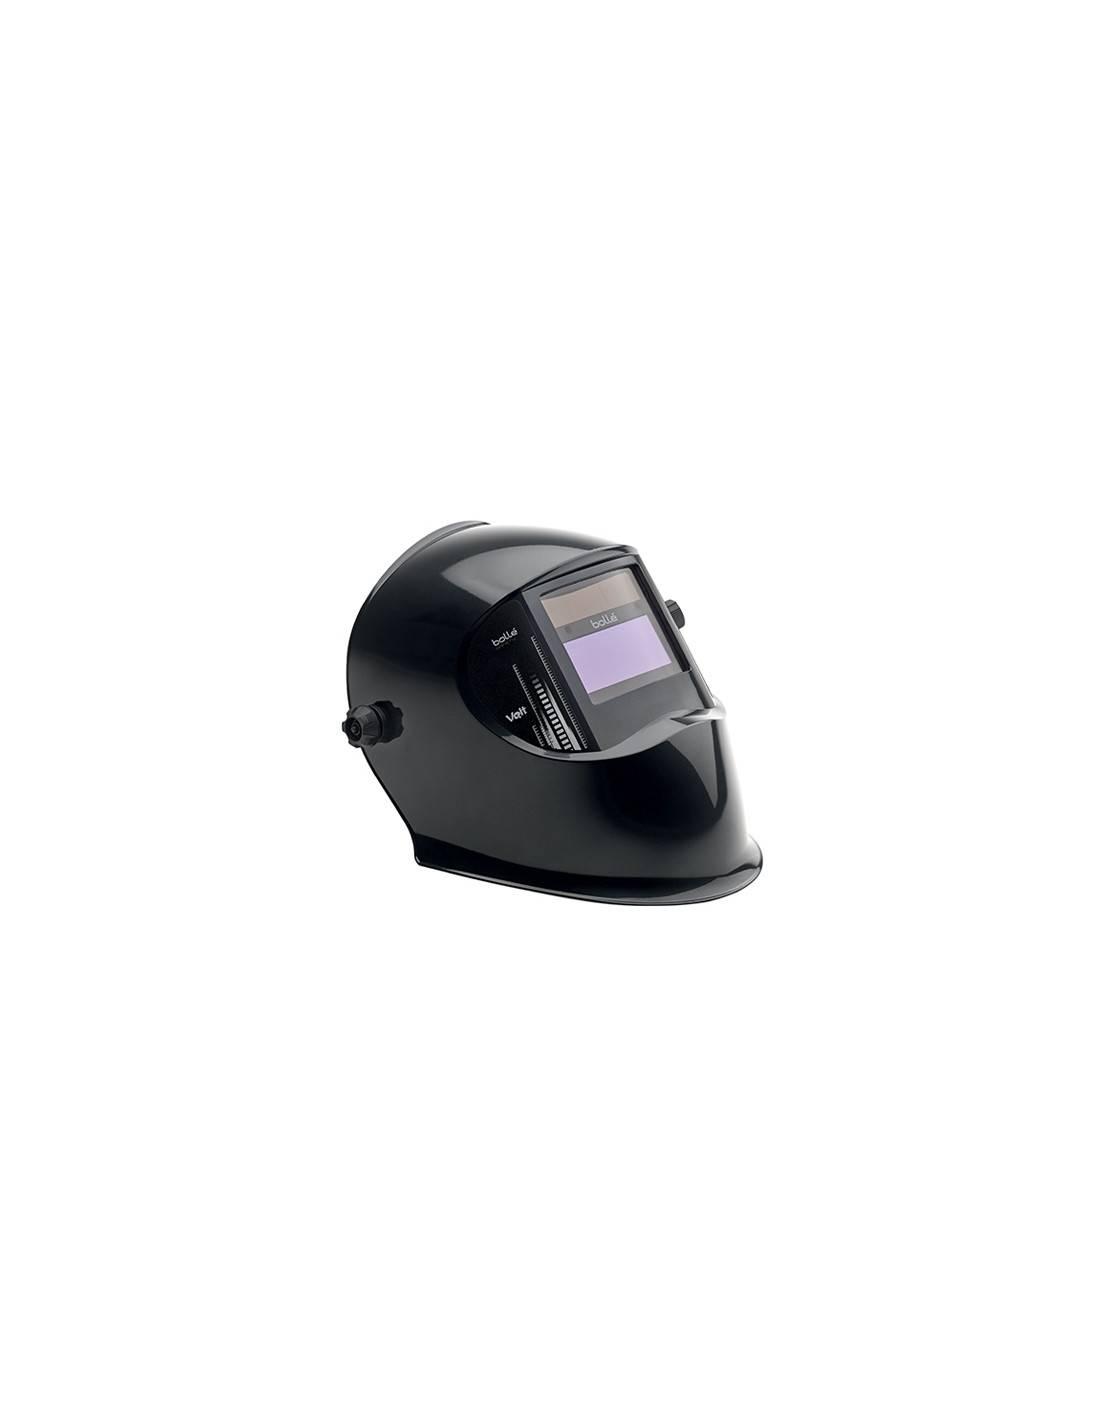 d685b0d70e8ea1 Masque de soudeur Volt MIG MAG - TIG - meulage VOLTV - Bolle. Promo - 62 %